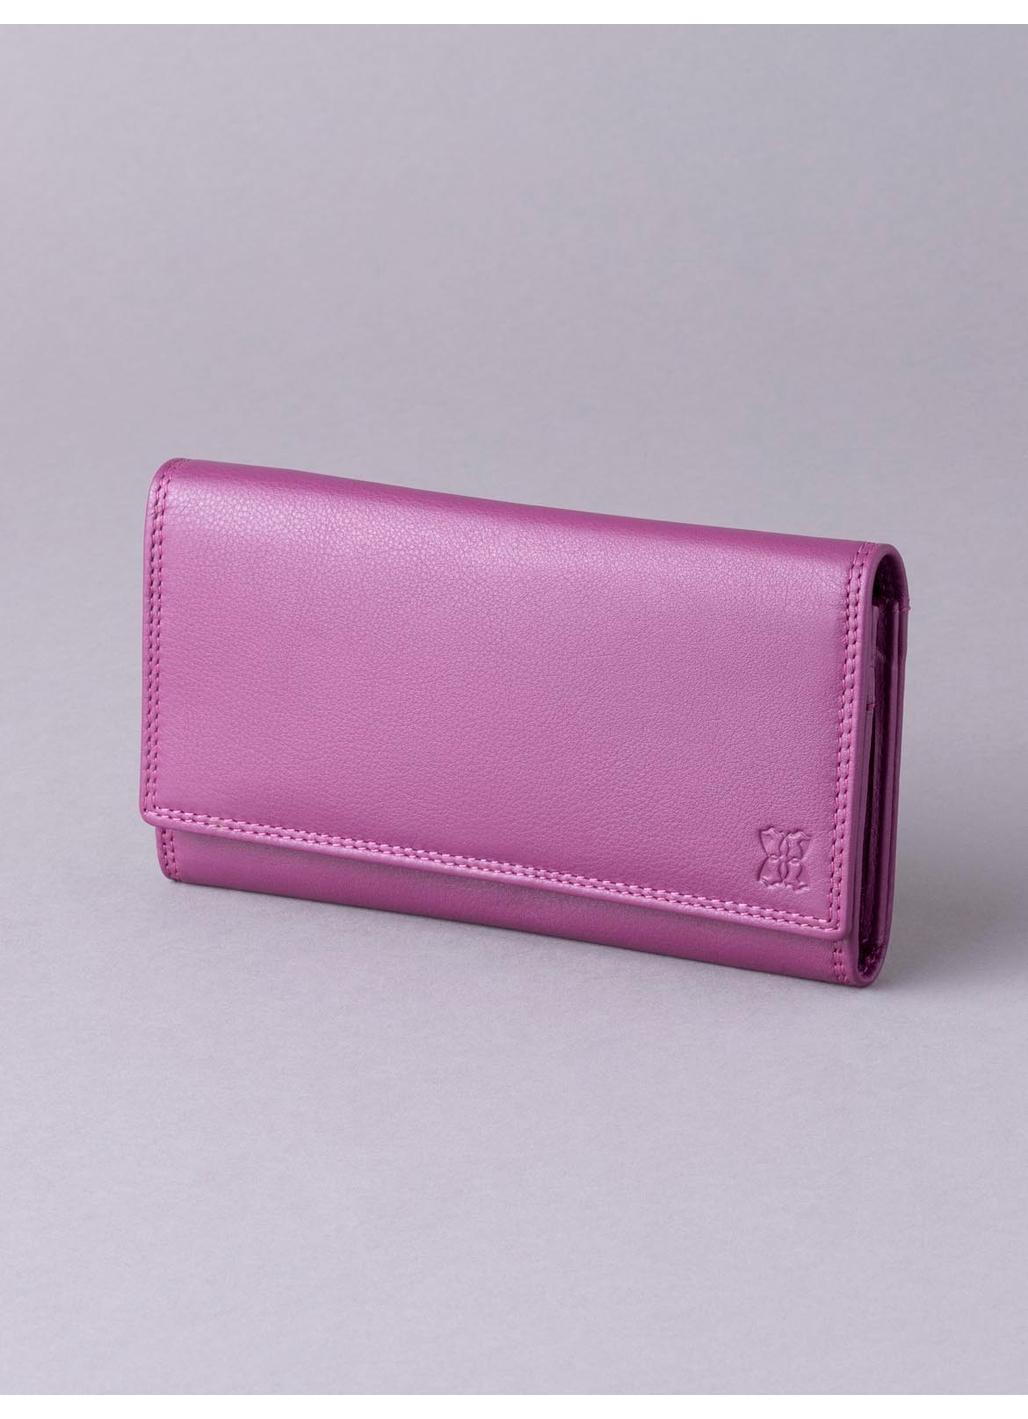 19cm Leather Purse in Fuchsia Pink